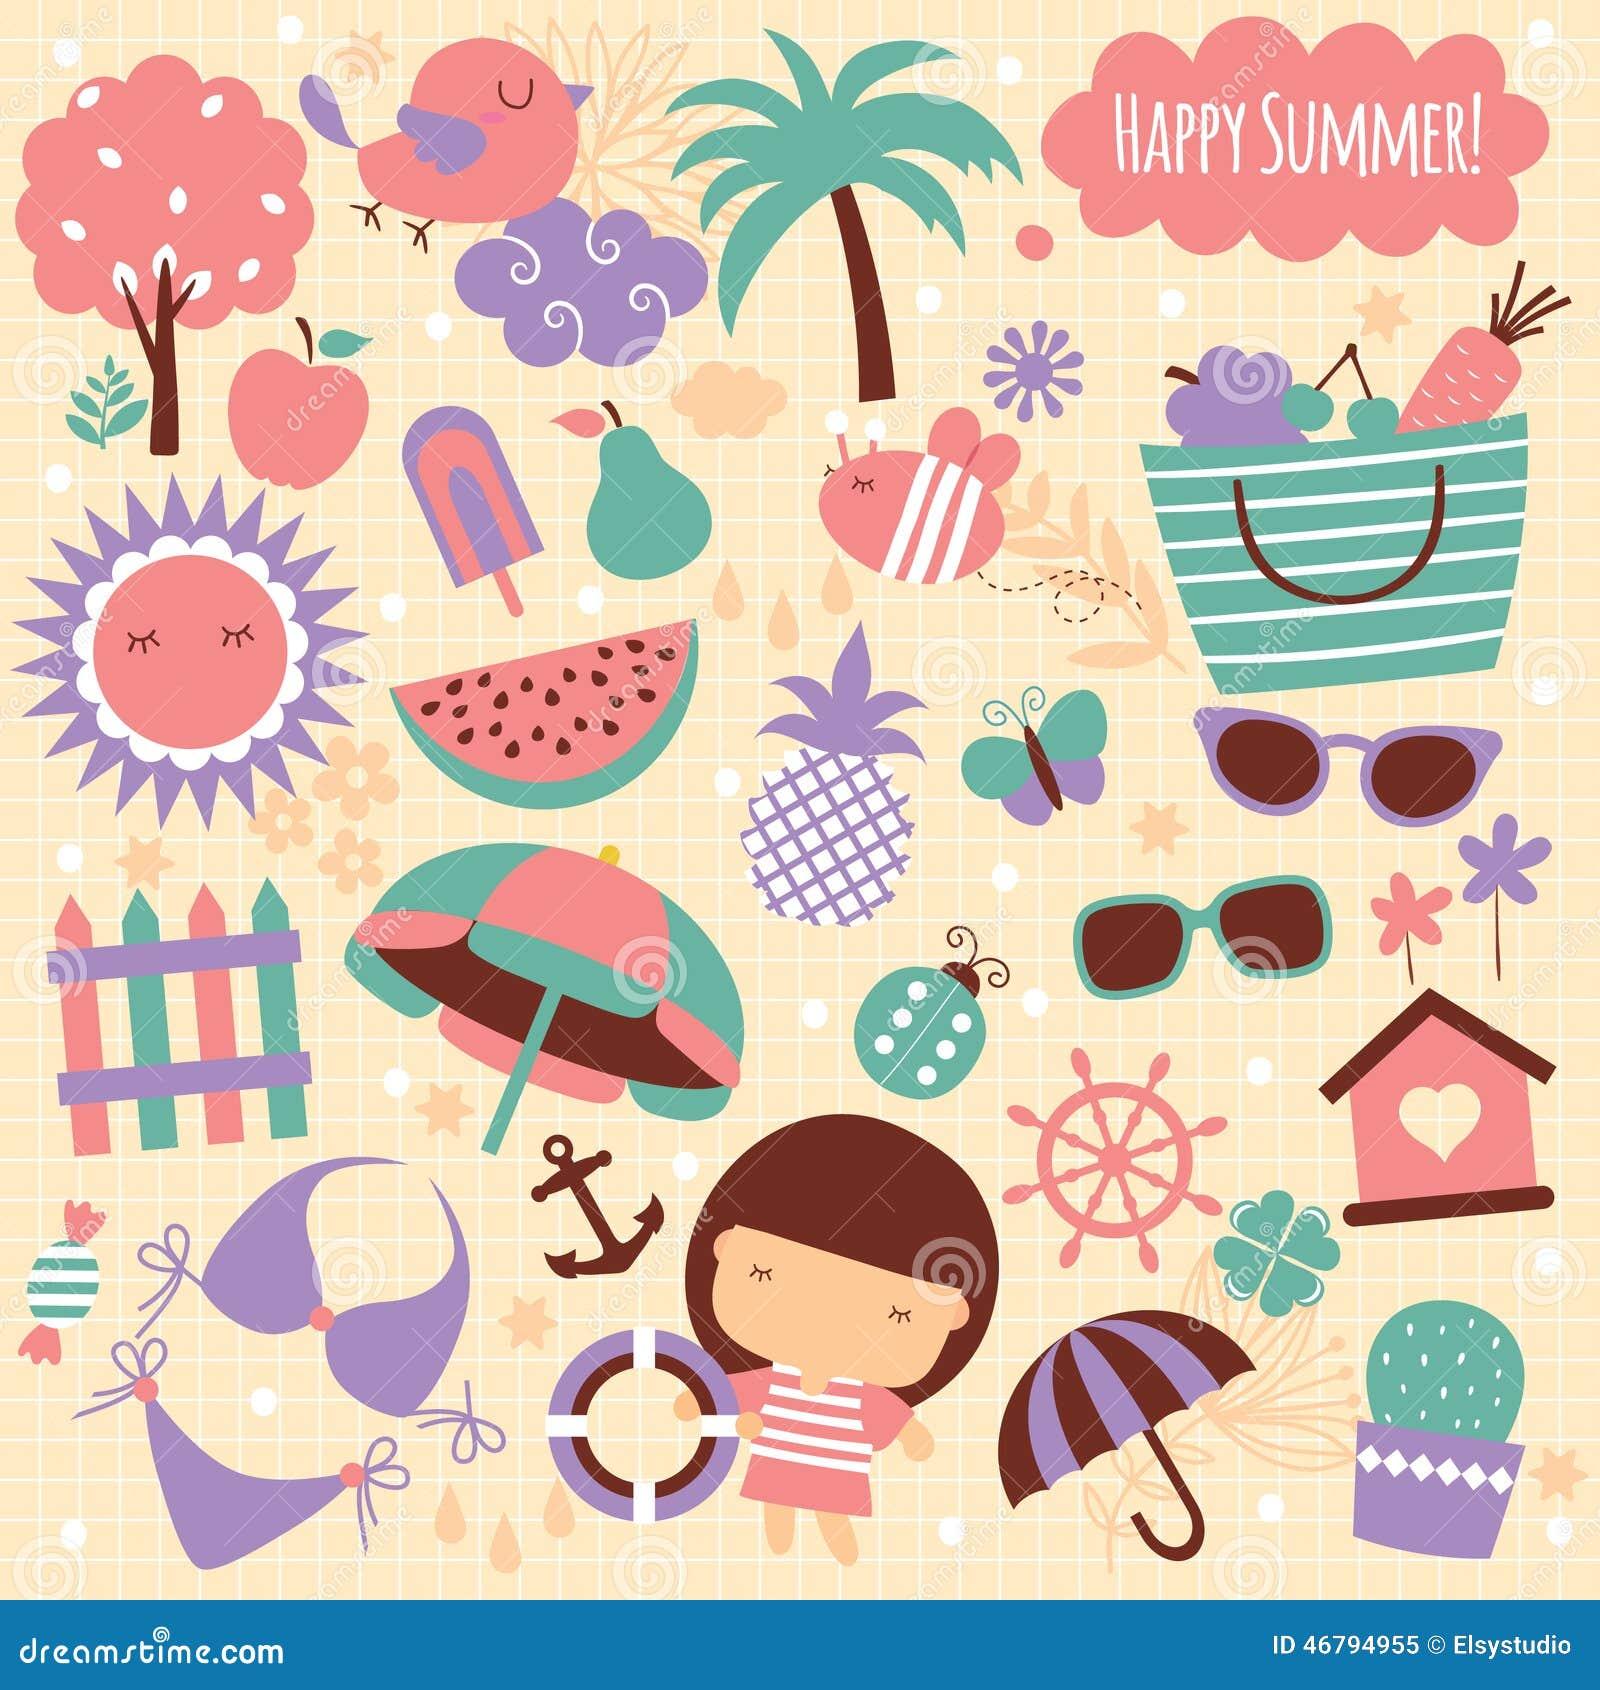 Summer Season Clip Art Elements Stock Illustration ...